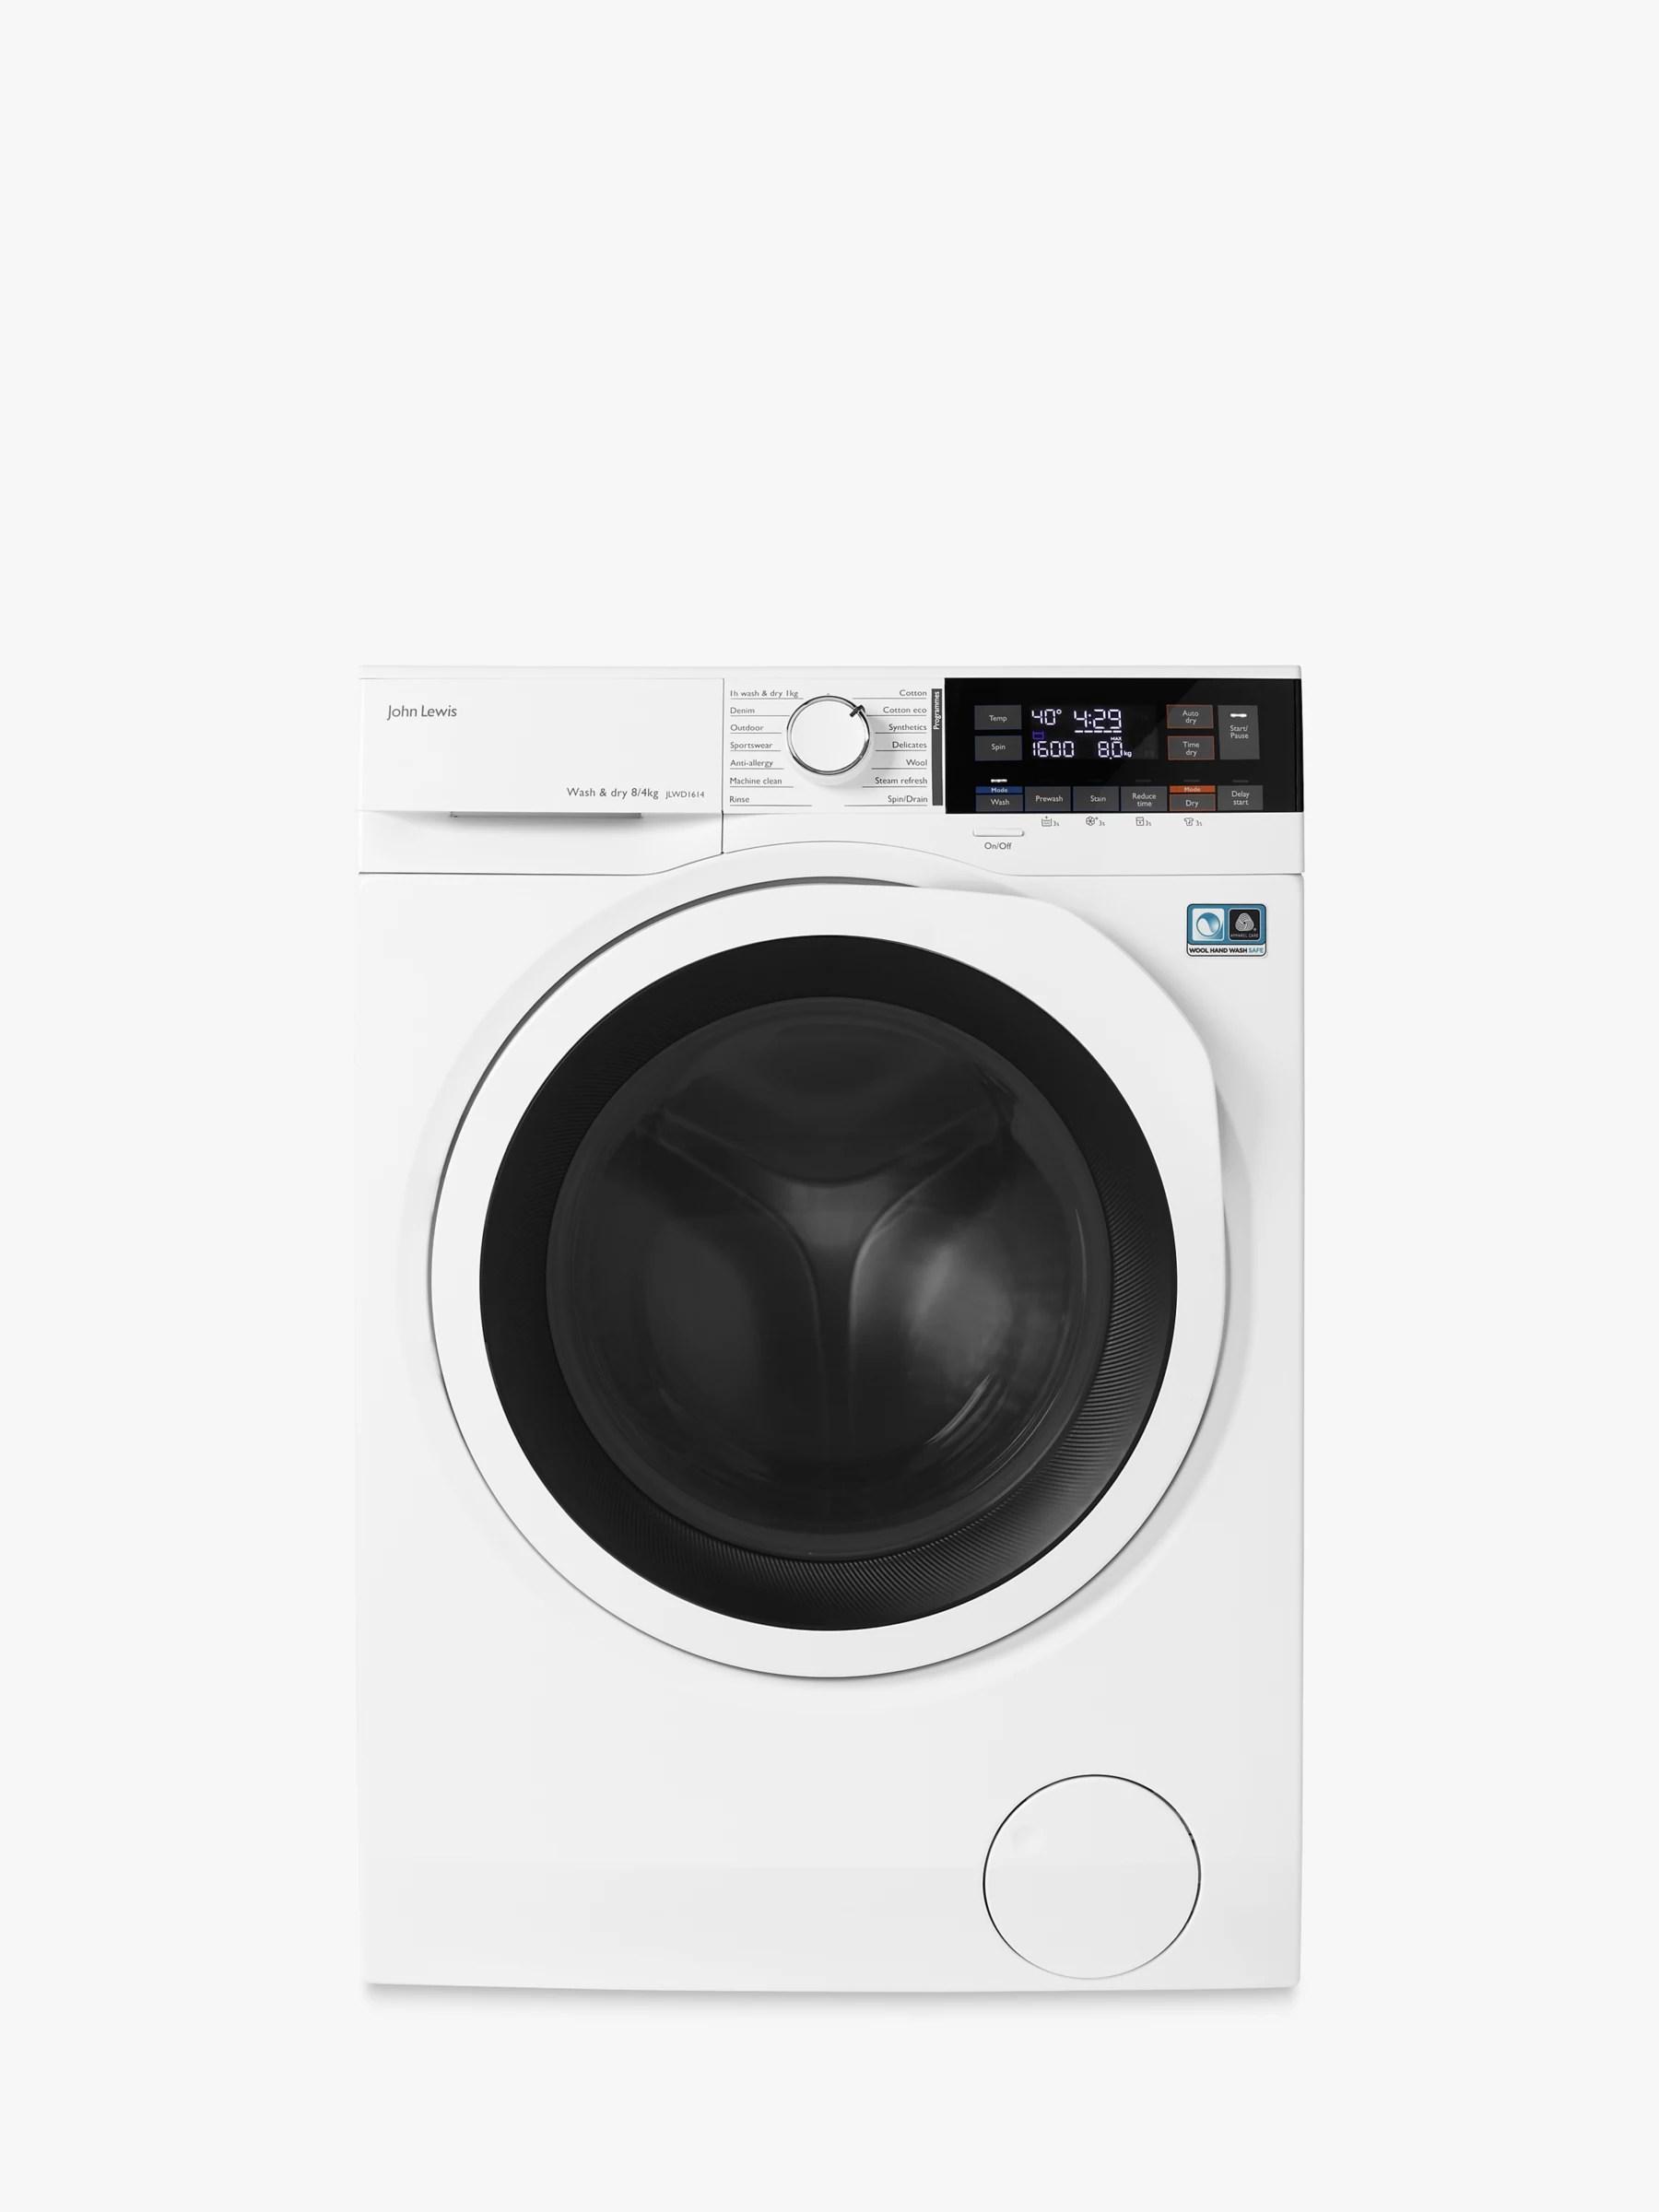 buy john lewis partners jlwd1614 freestanding washer dryer 8kg wash 4kg dry load  [ 1440 x 1920 Pixel ]